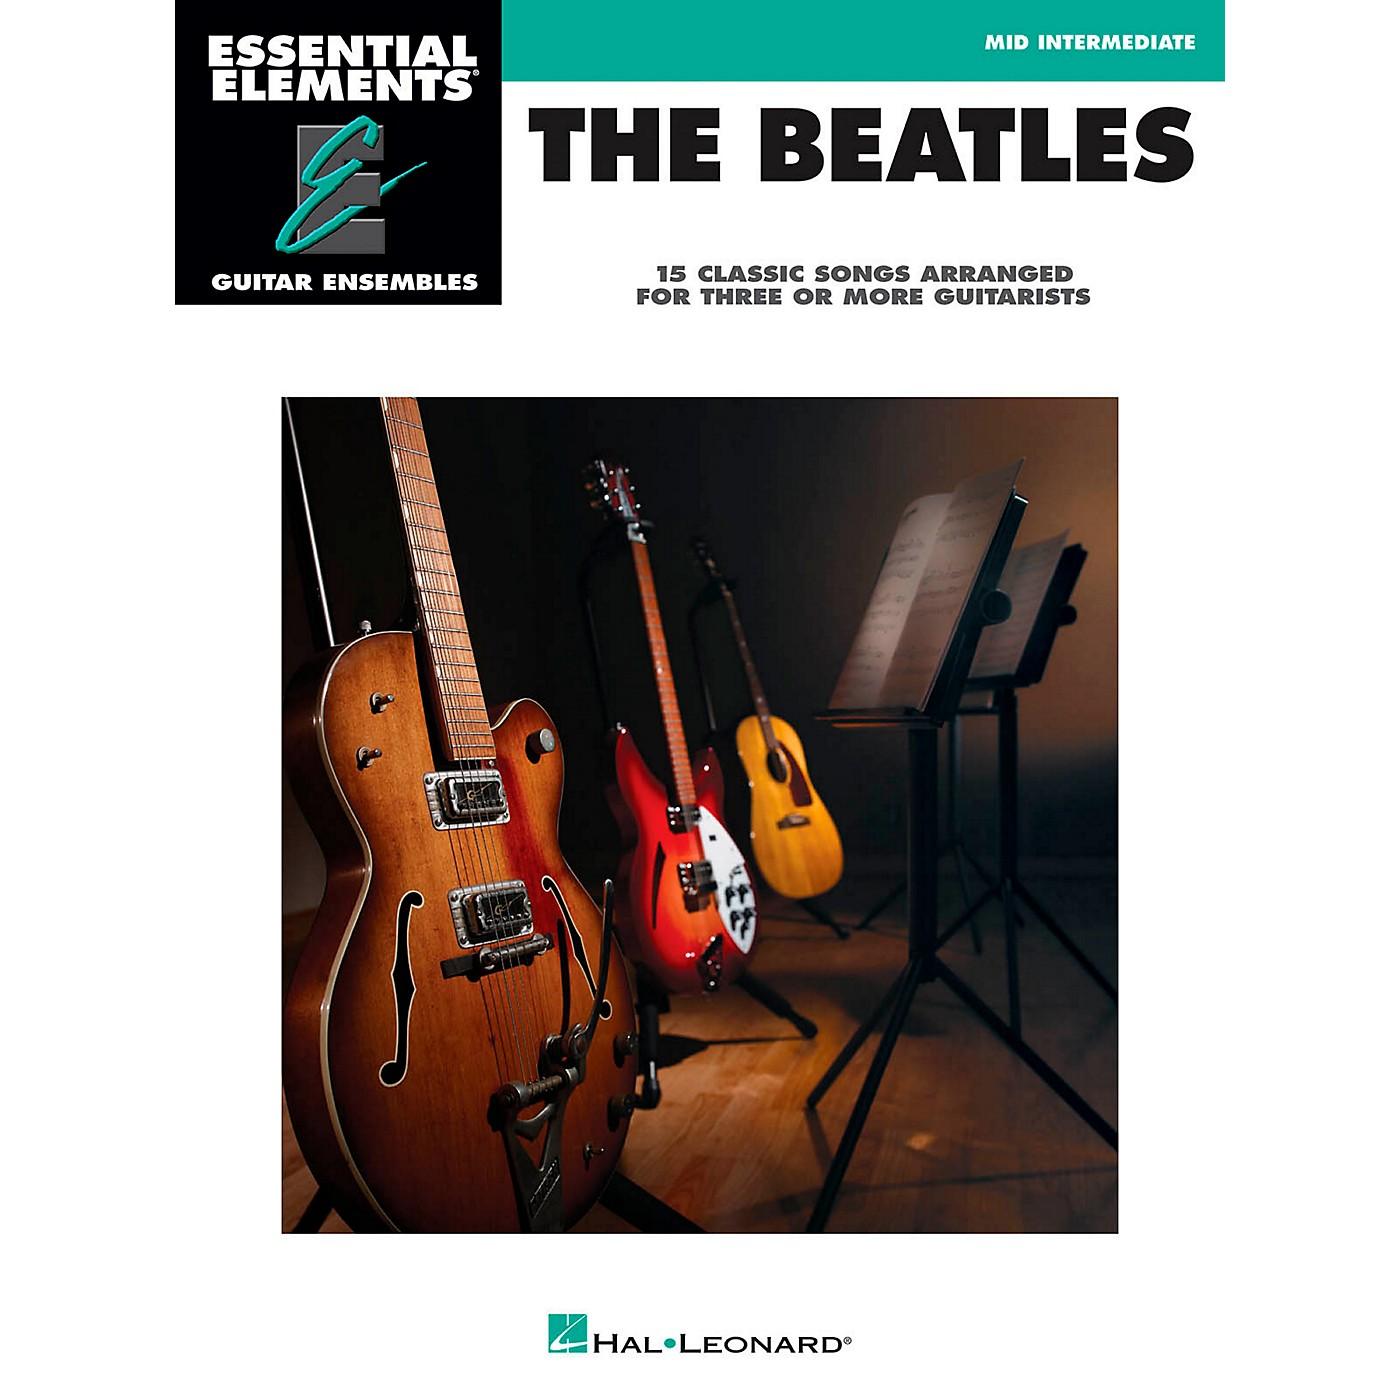 Hal Leonard The Beatles - Essential Elements Guitar Ensembles Series thumbnail